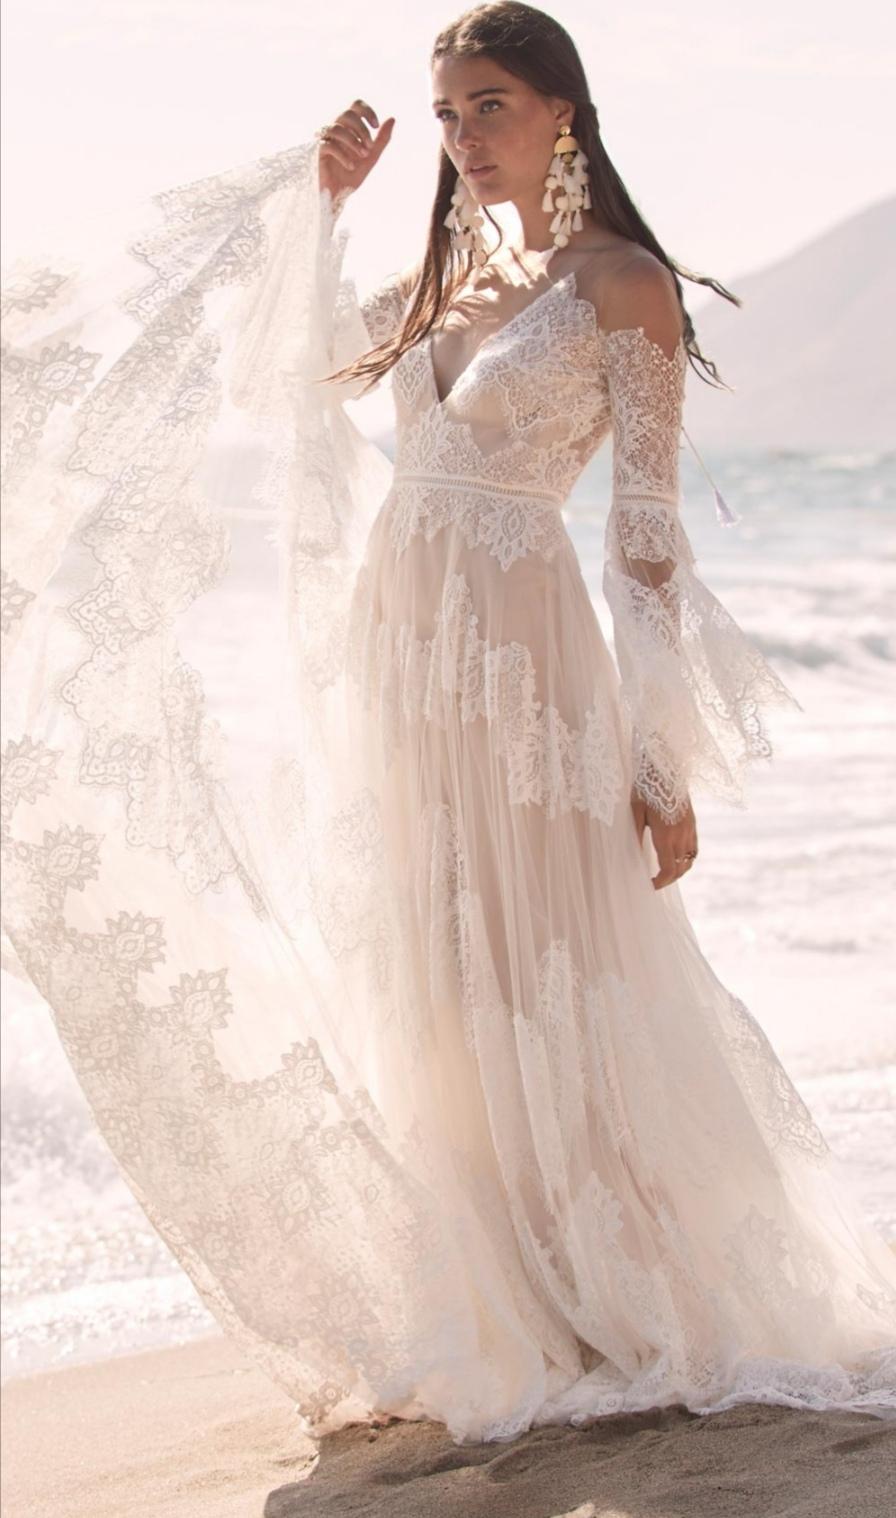 Watters Boho Wedding Dresses Kiss The Bride Magazine,October Wedding Guest Autumn Dresses 2020